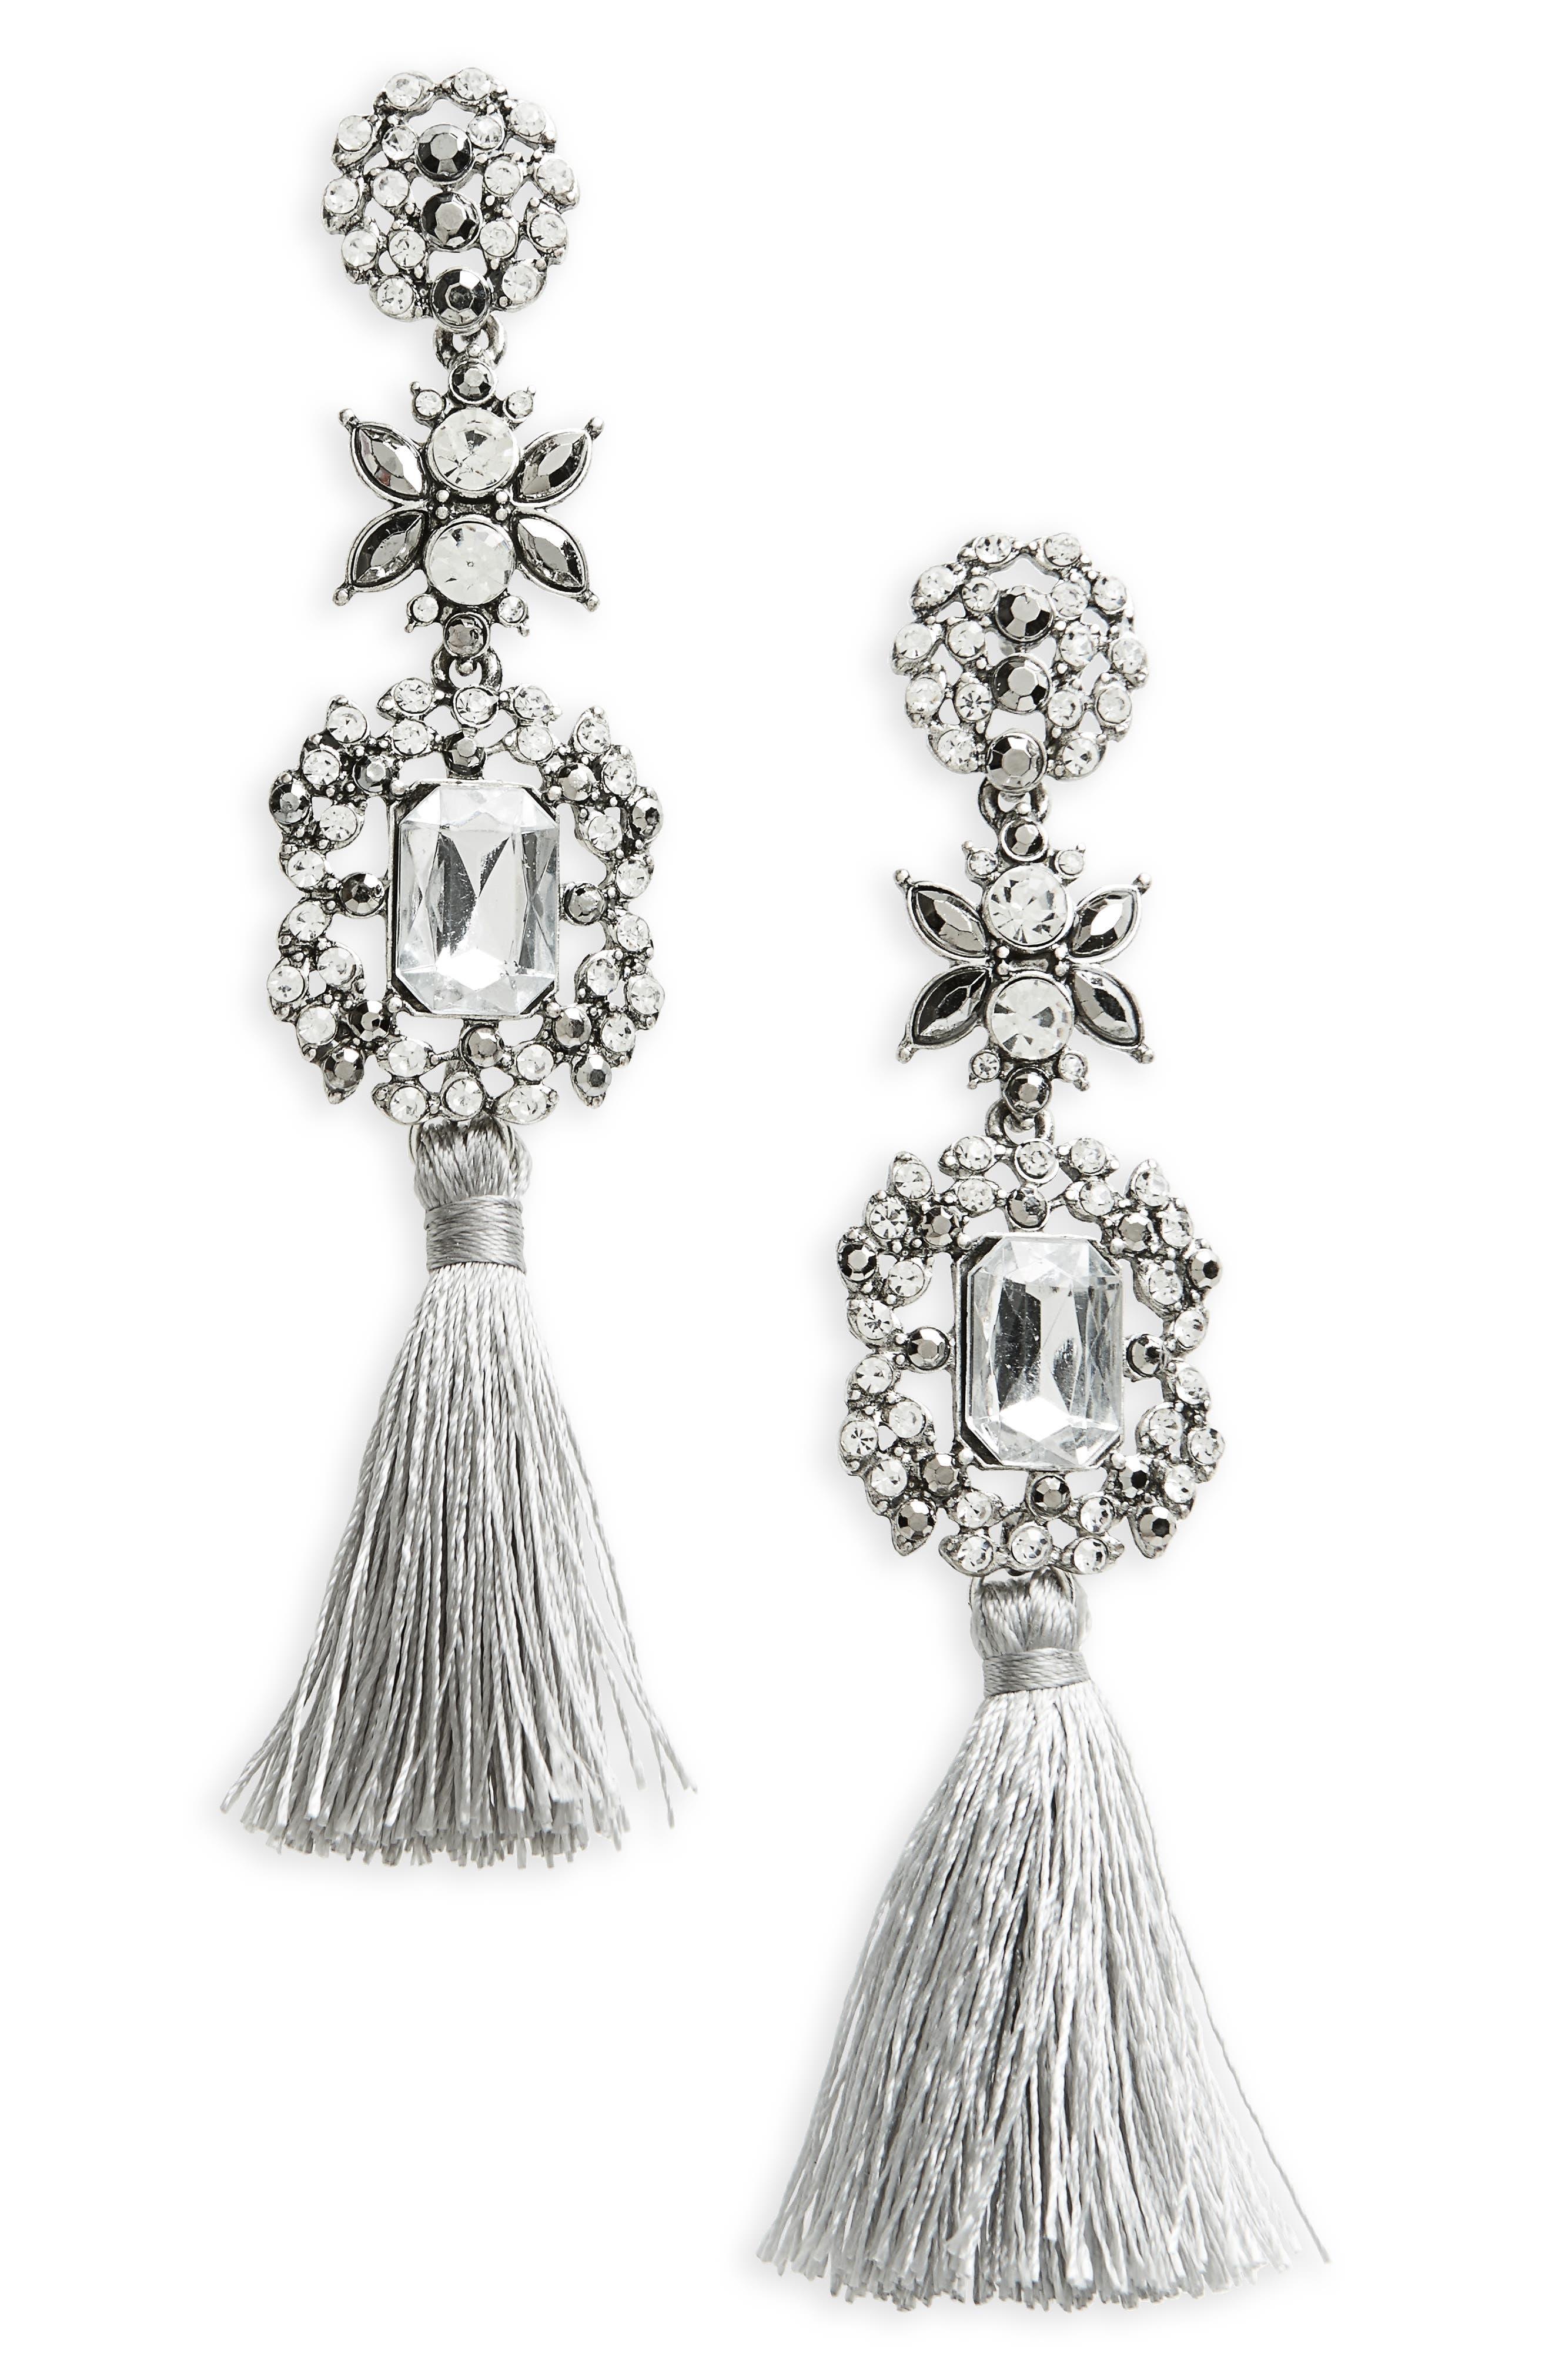 Crystal Tassel Drop Earrings,                             Main thumbnail 1, color,                             Crystal